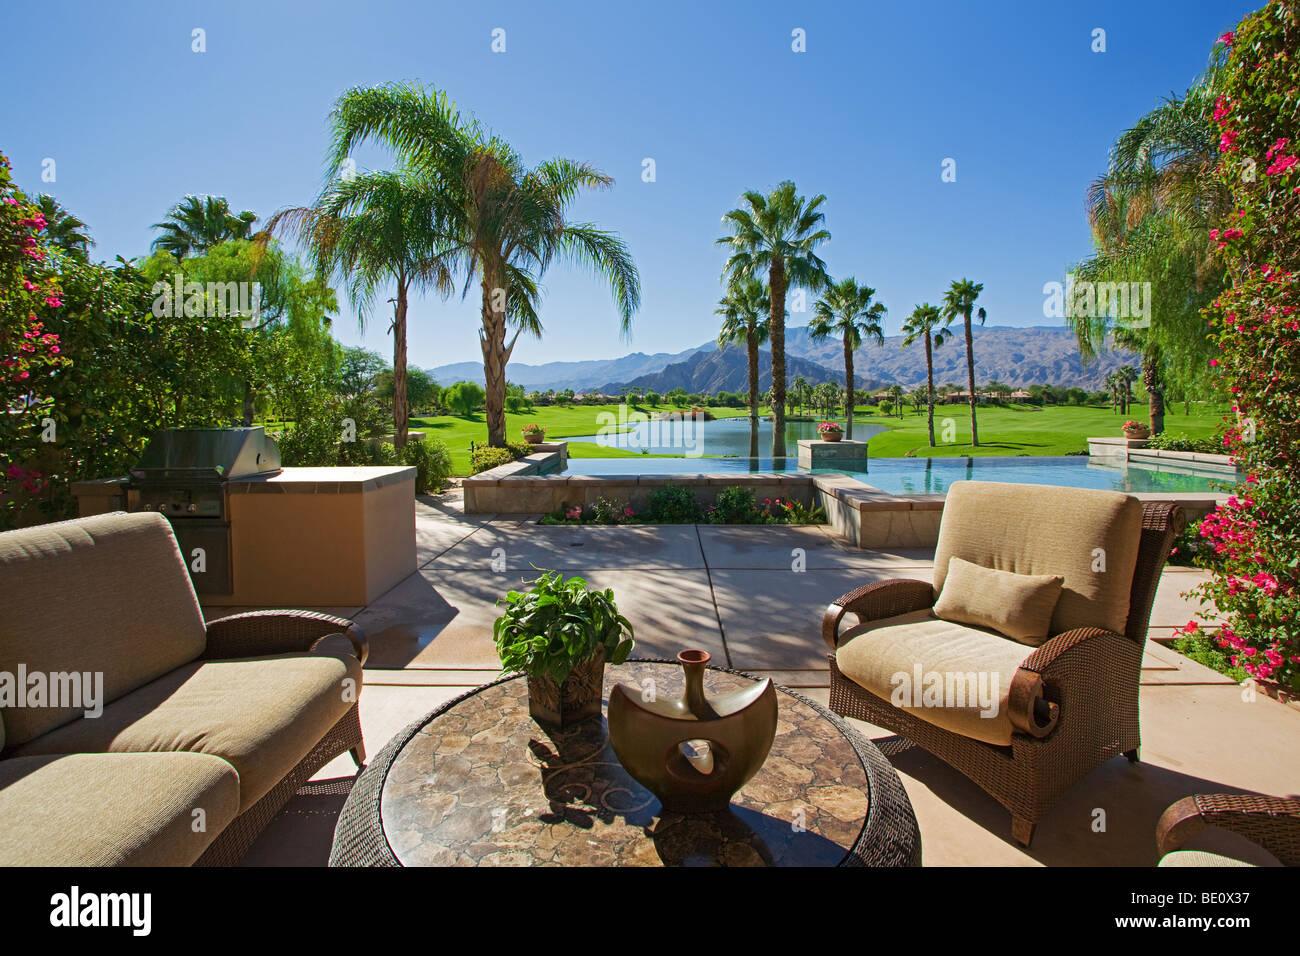 Vista diurna de asientos al aire libre con piscina en segundo plano. Imagen De Stock